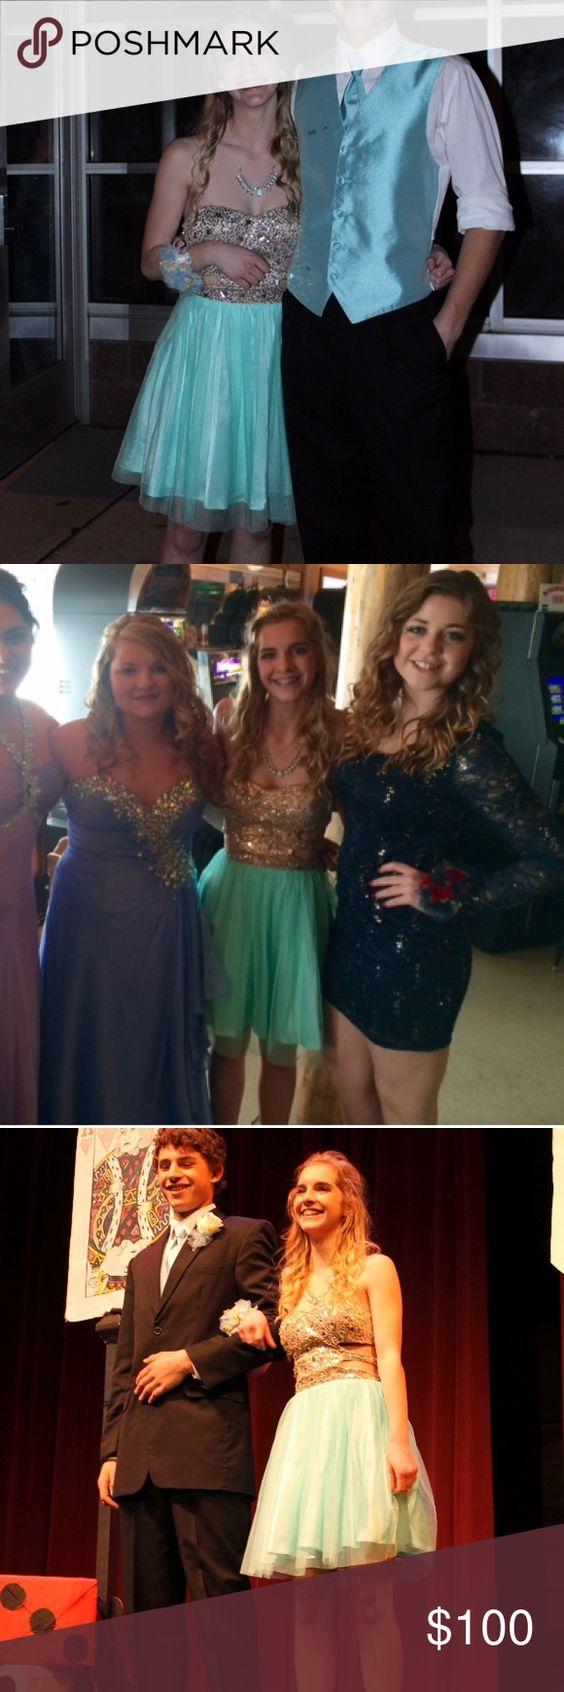 Super cute short prom dress with side cutouts blue corset prom